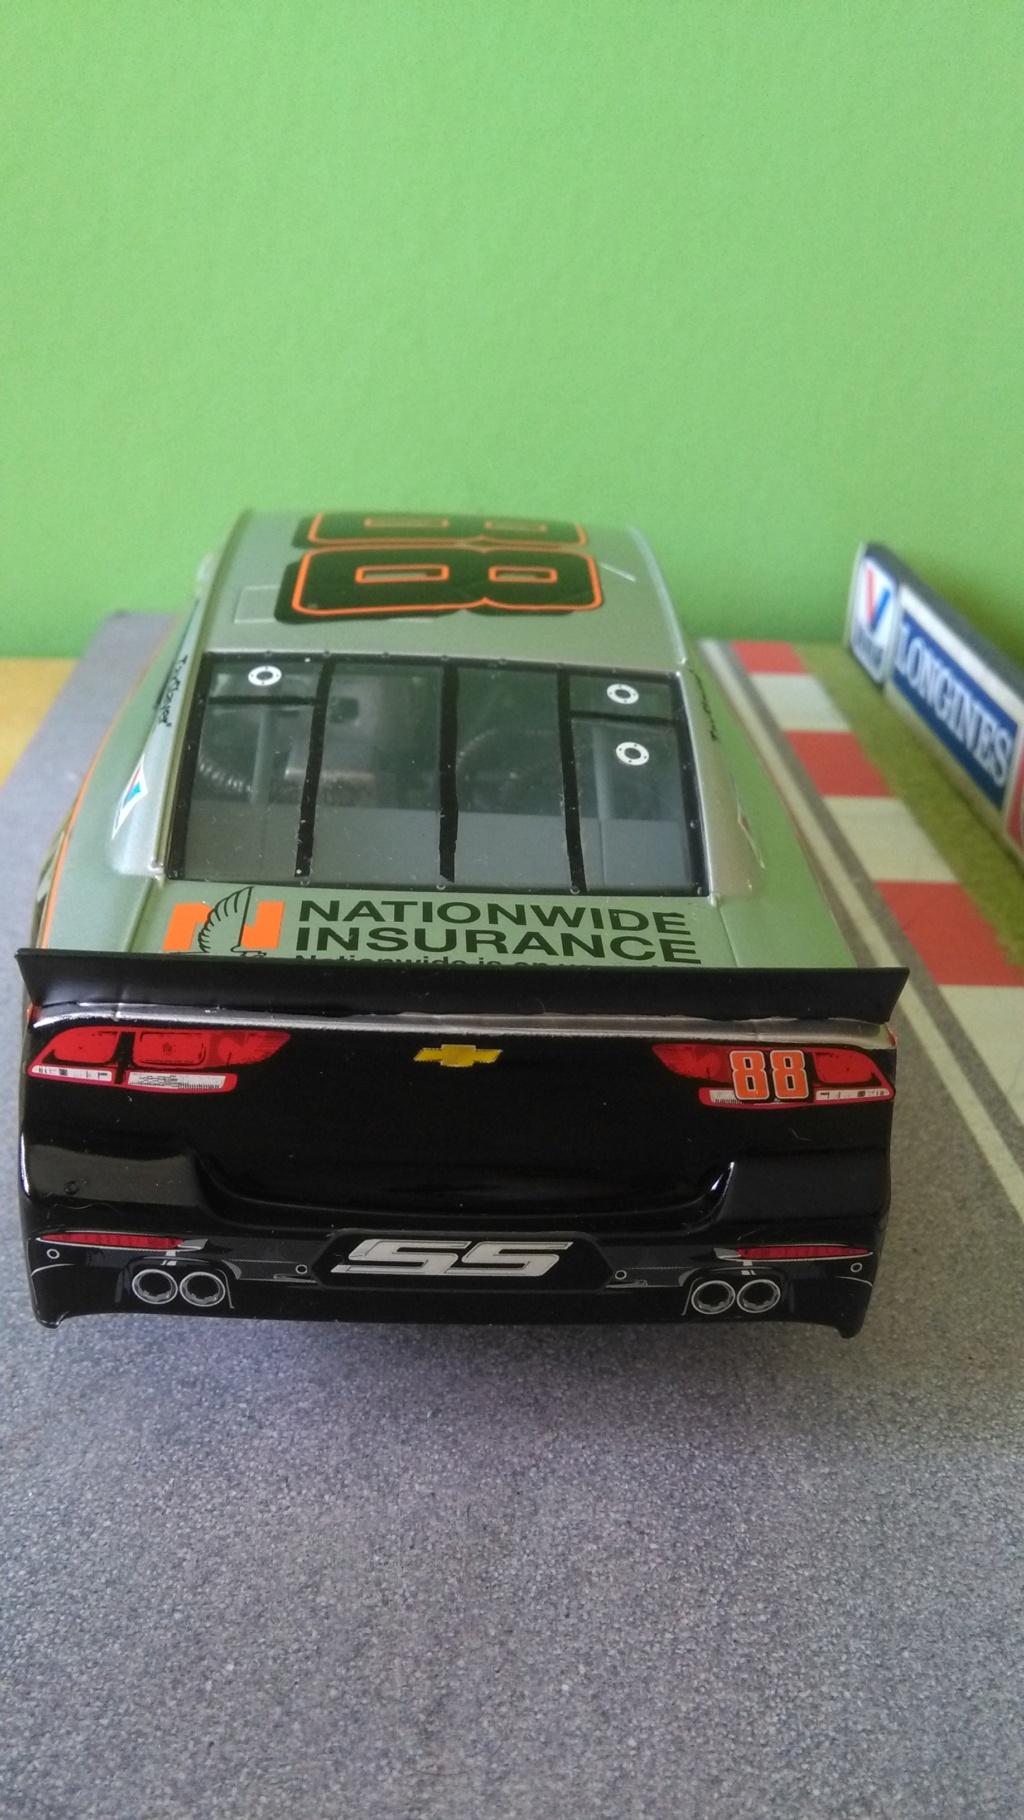 Chevy SS 2016 #88 Jeff gordon nationwide insurance Img_2049